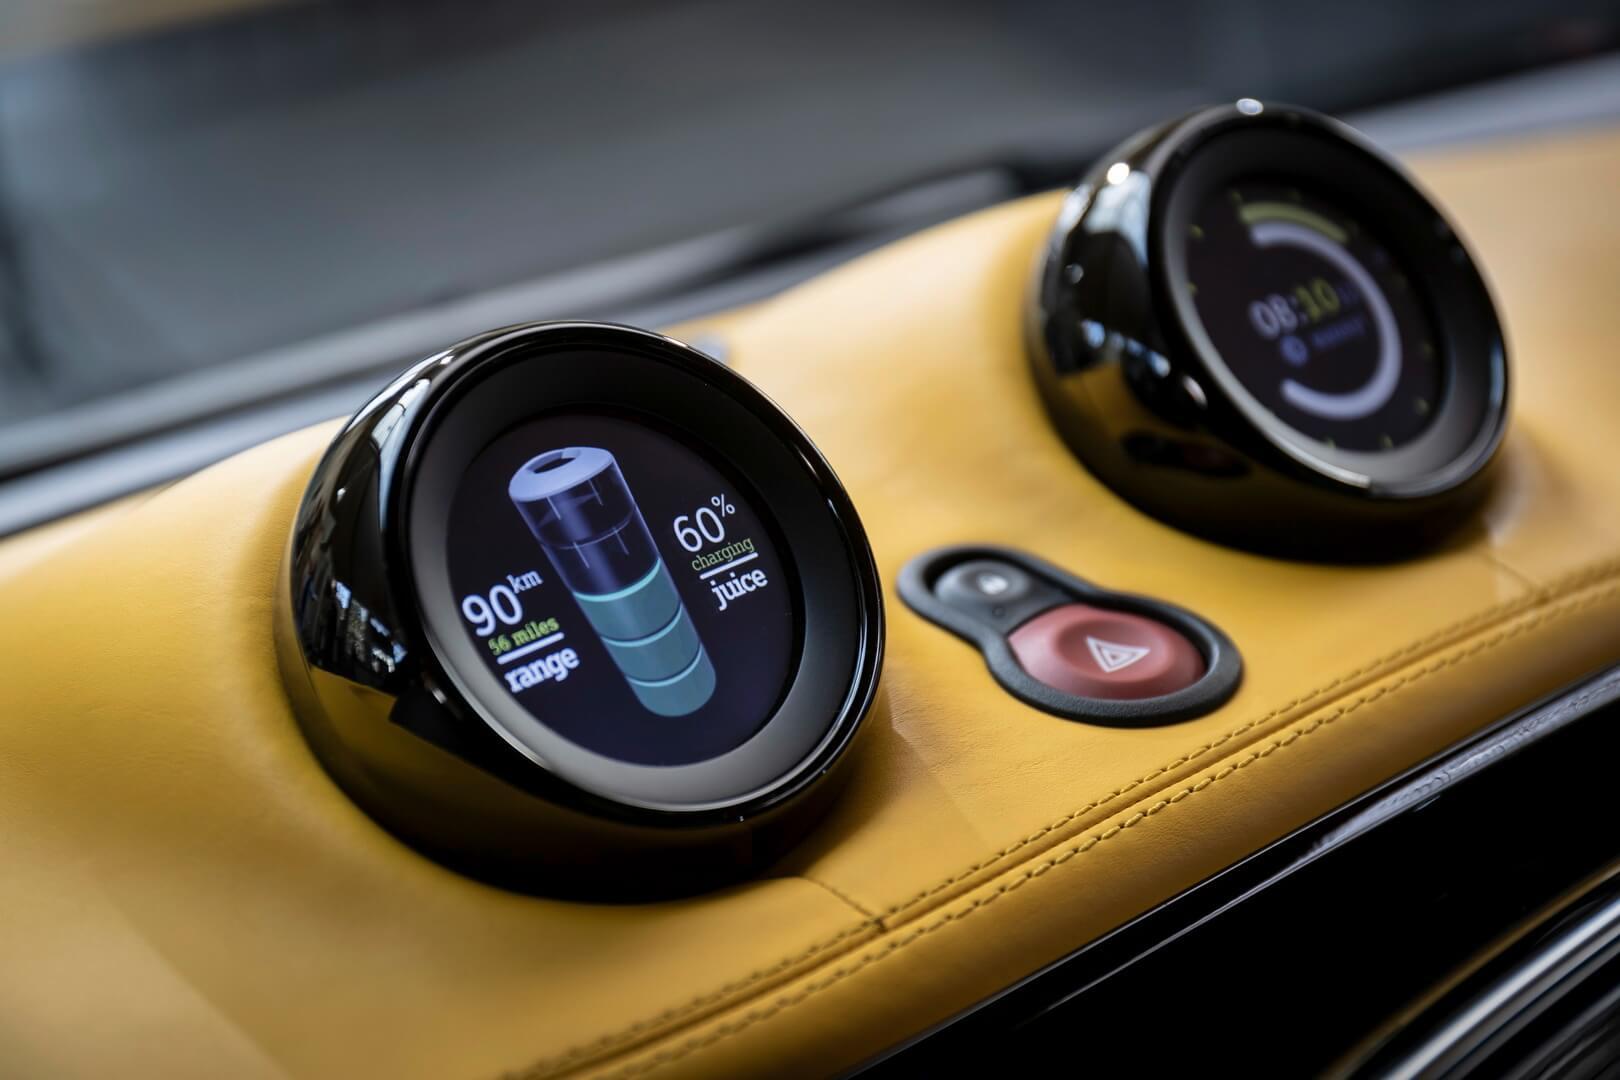 Индикатор заряда электромобиля Smart Forease +